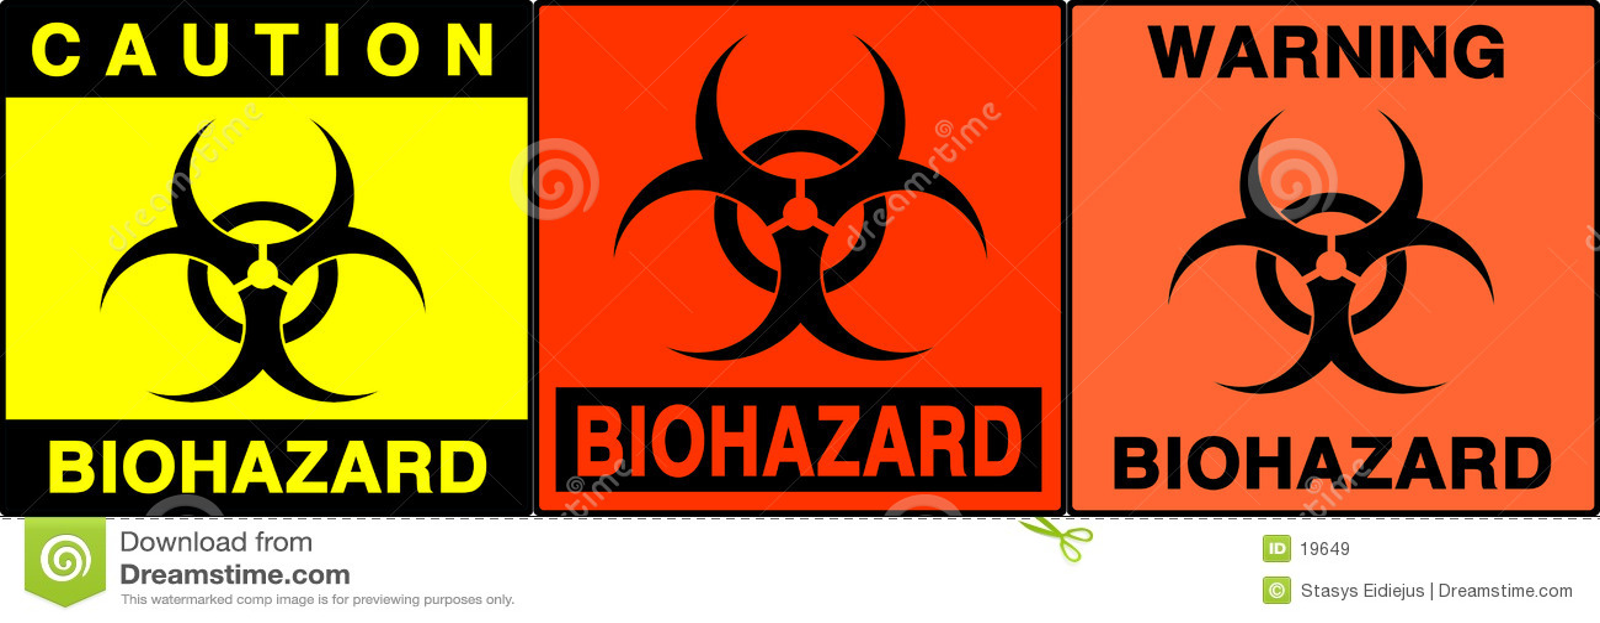 Cuidado/sinais de aviso ajustados, II